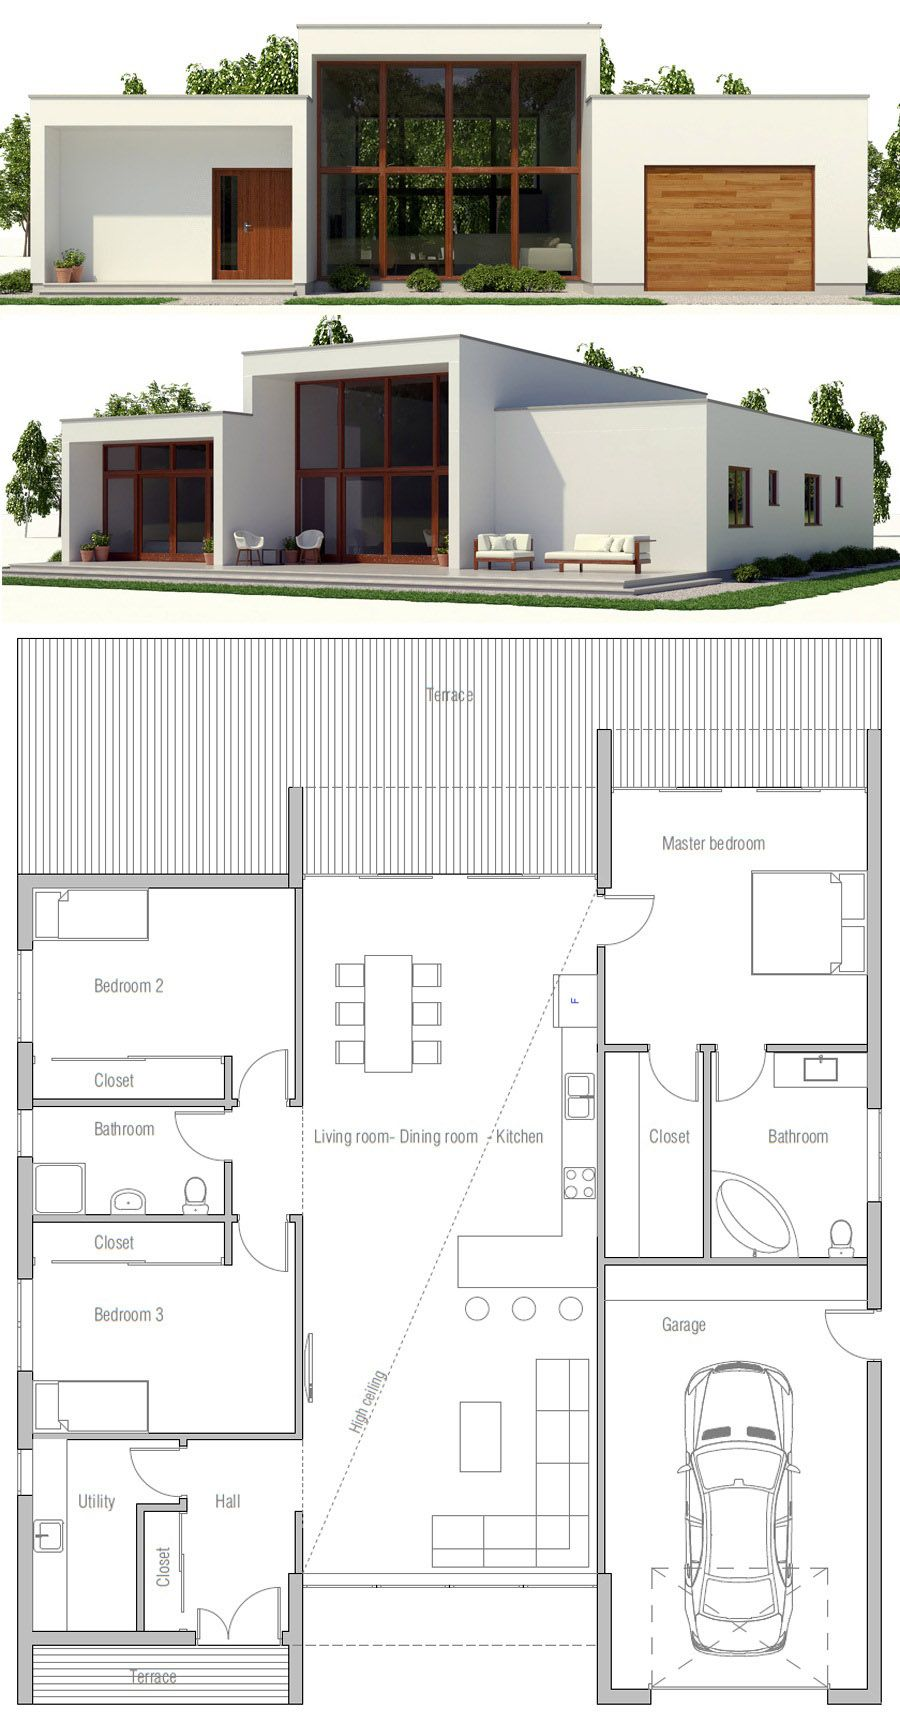 Minimalist House Plan Contemporary House Designs Contemporary Modernhome Minimalistliving Minimalist House Design Modern Minimalist House Sims House Plans